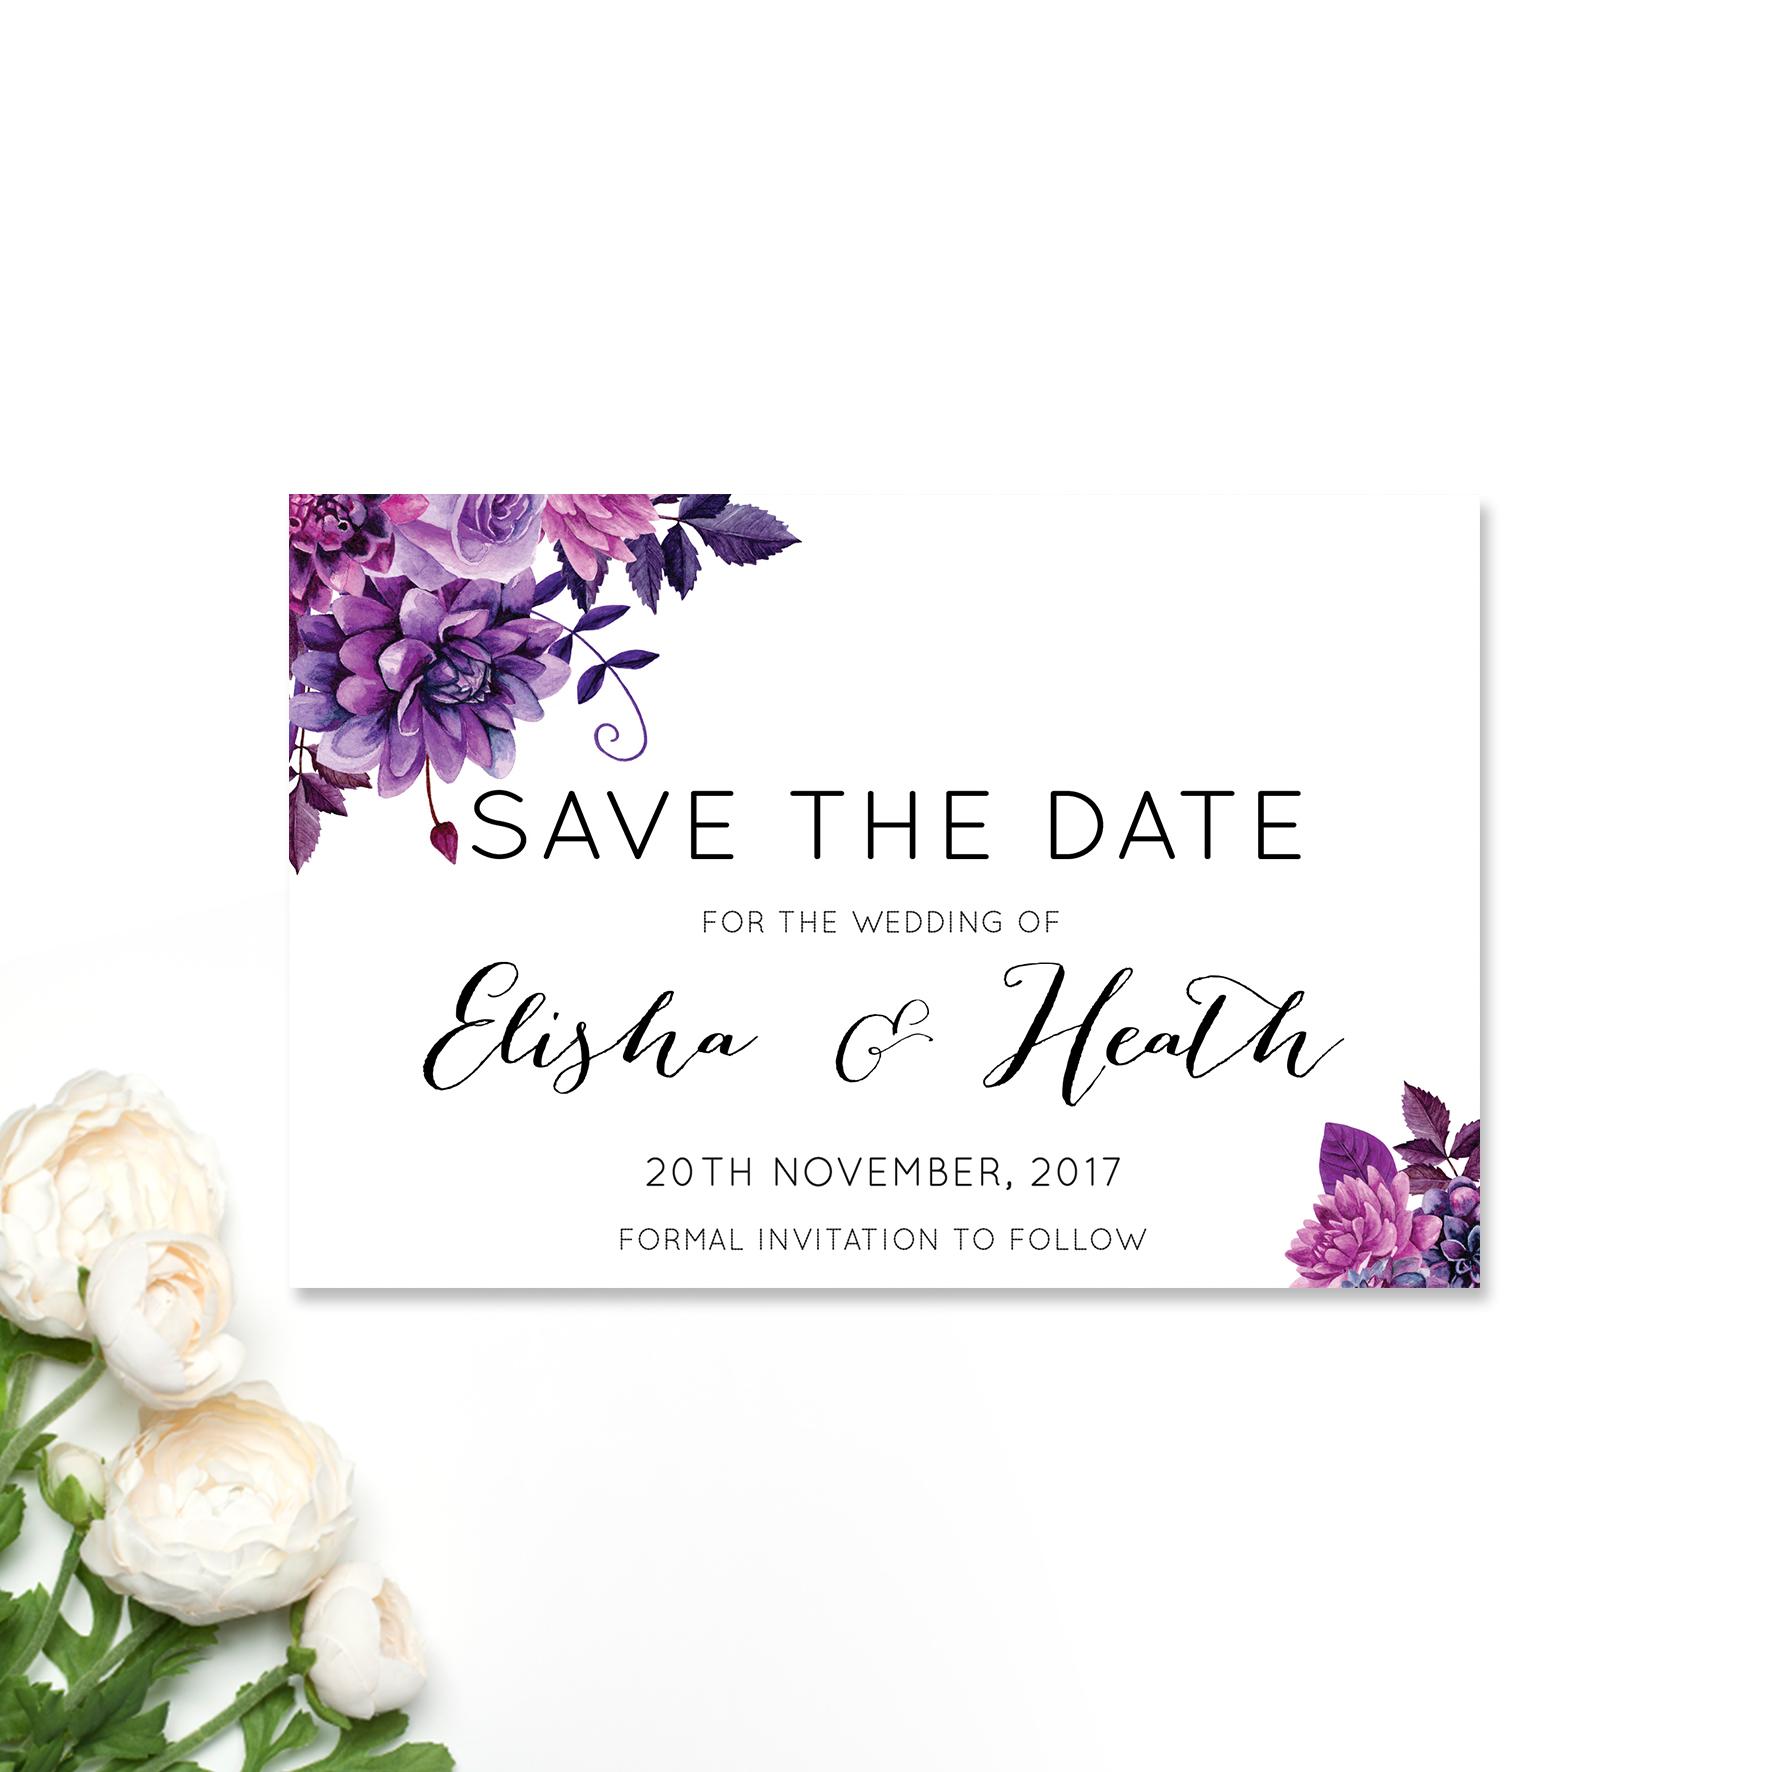 Elisha + Heath Save the Date CArd